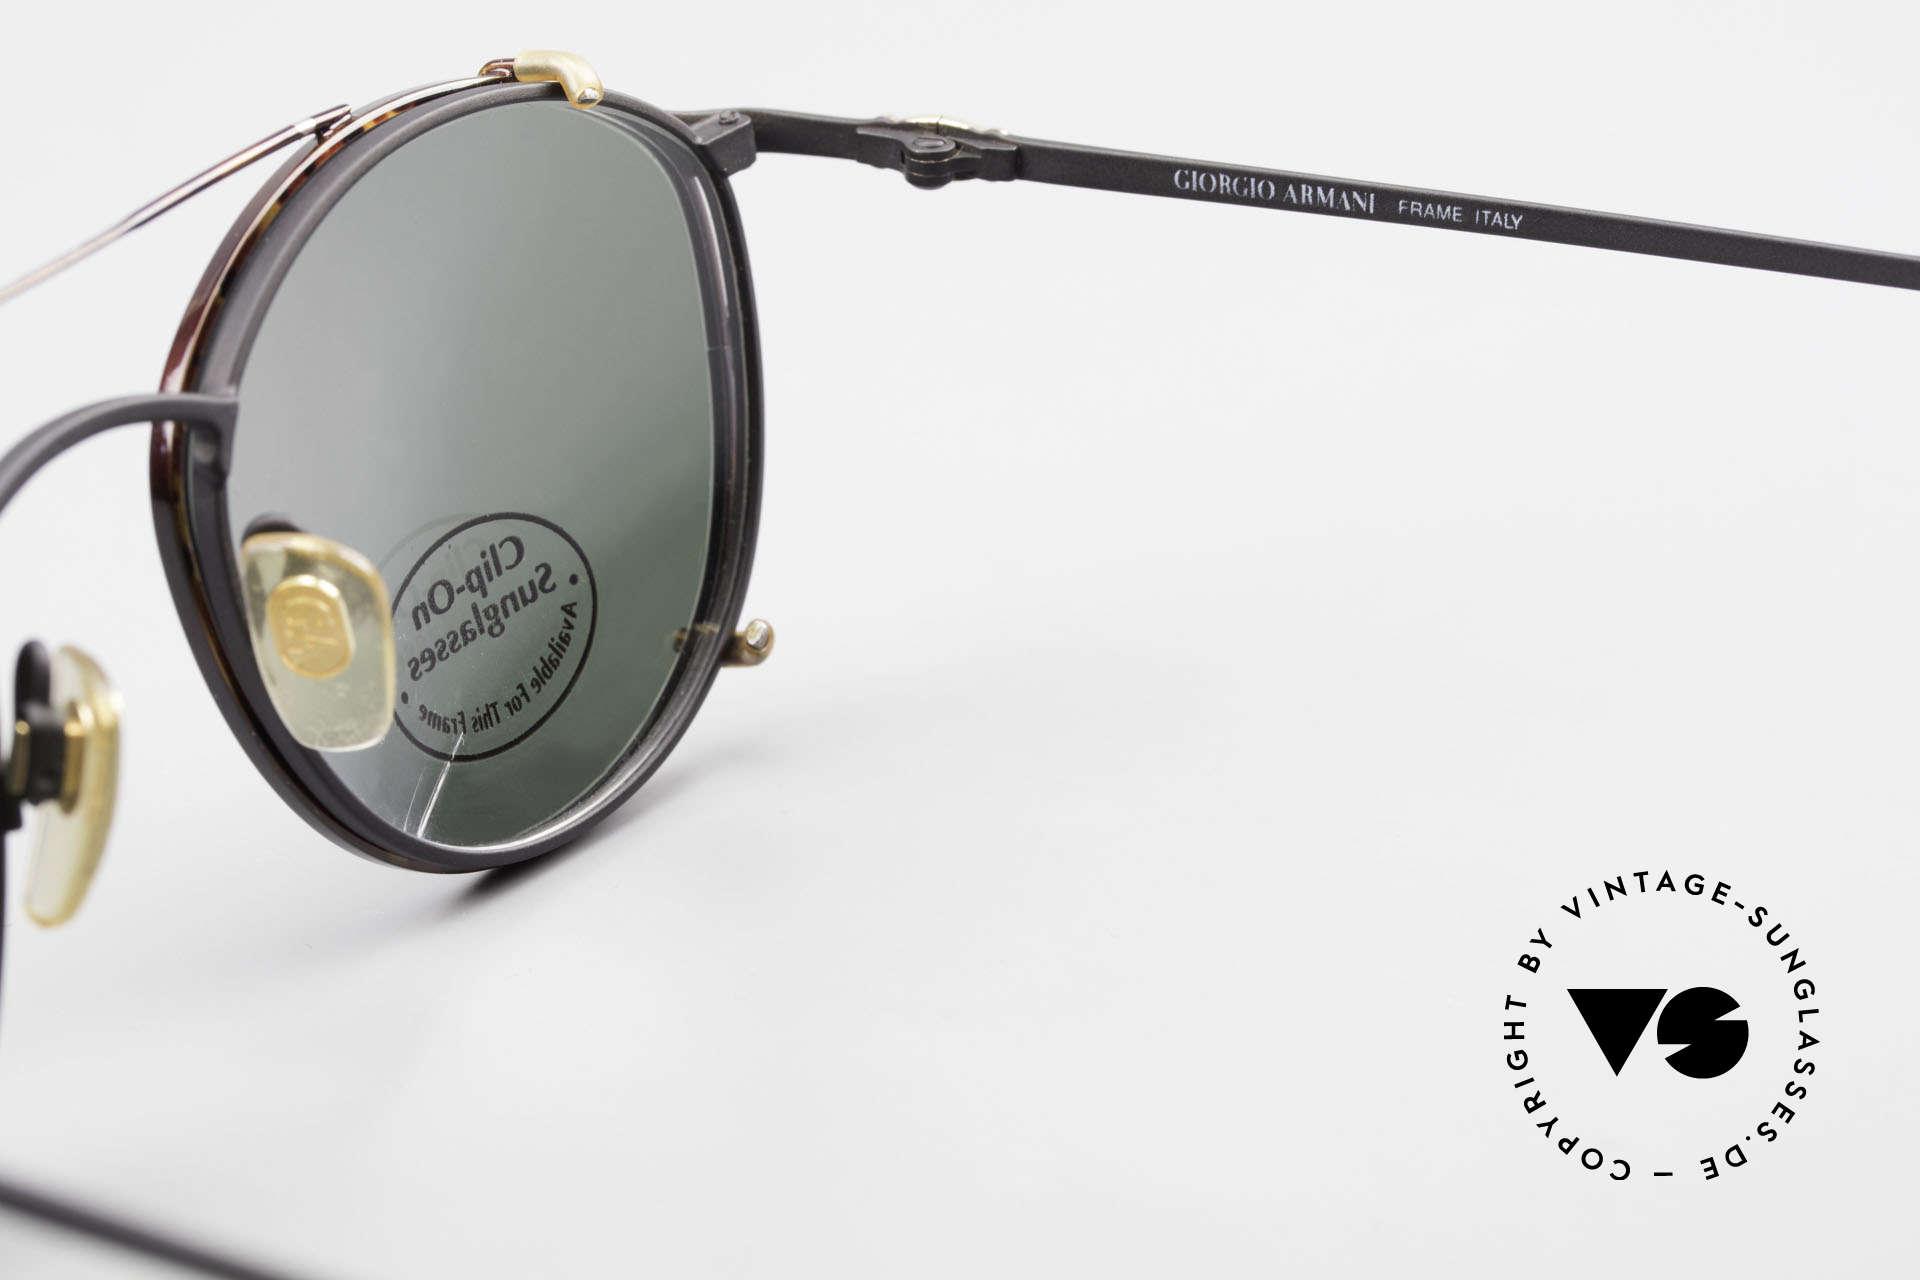 Giorgio Armani 132 Clip On Panto Eyeglasses 90's, NO retro specs, but a unique 30 years old ORIGINAL!, Made for Men